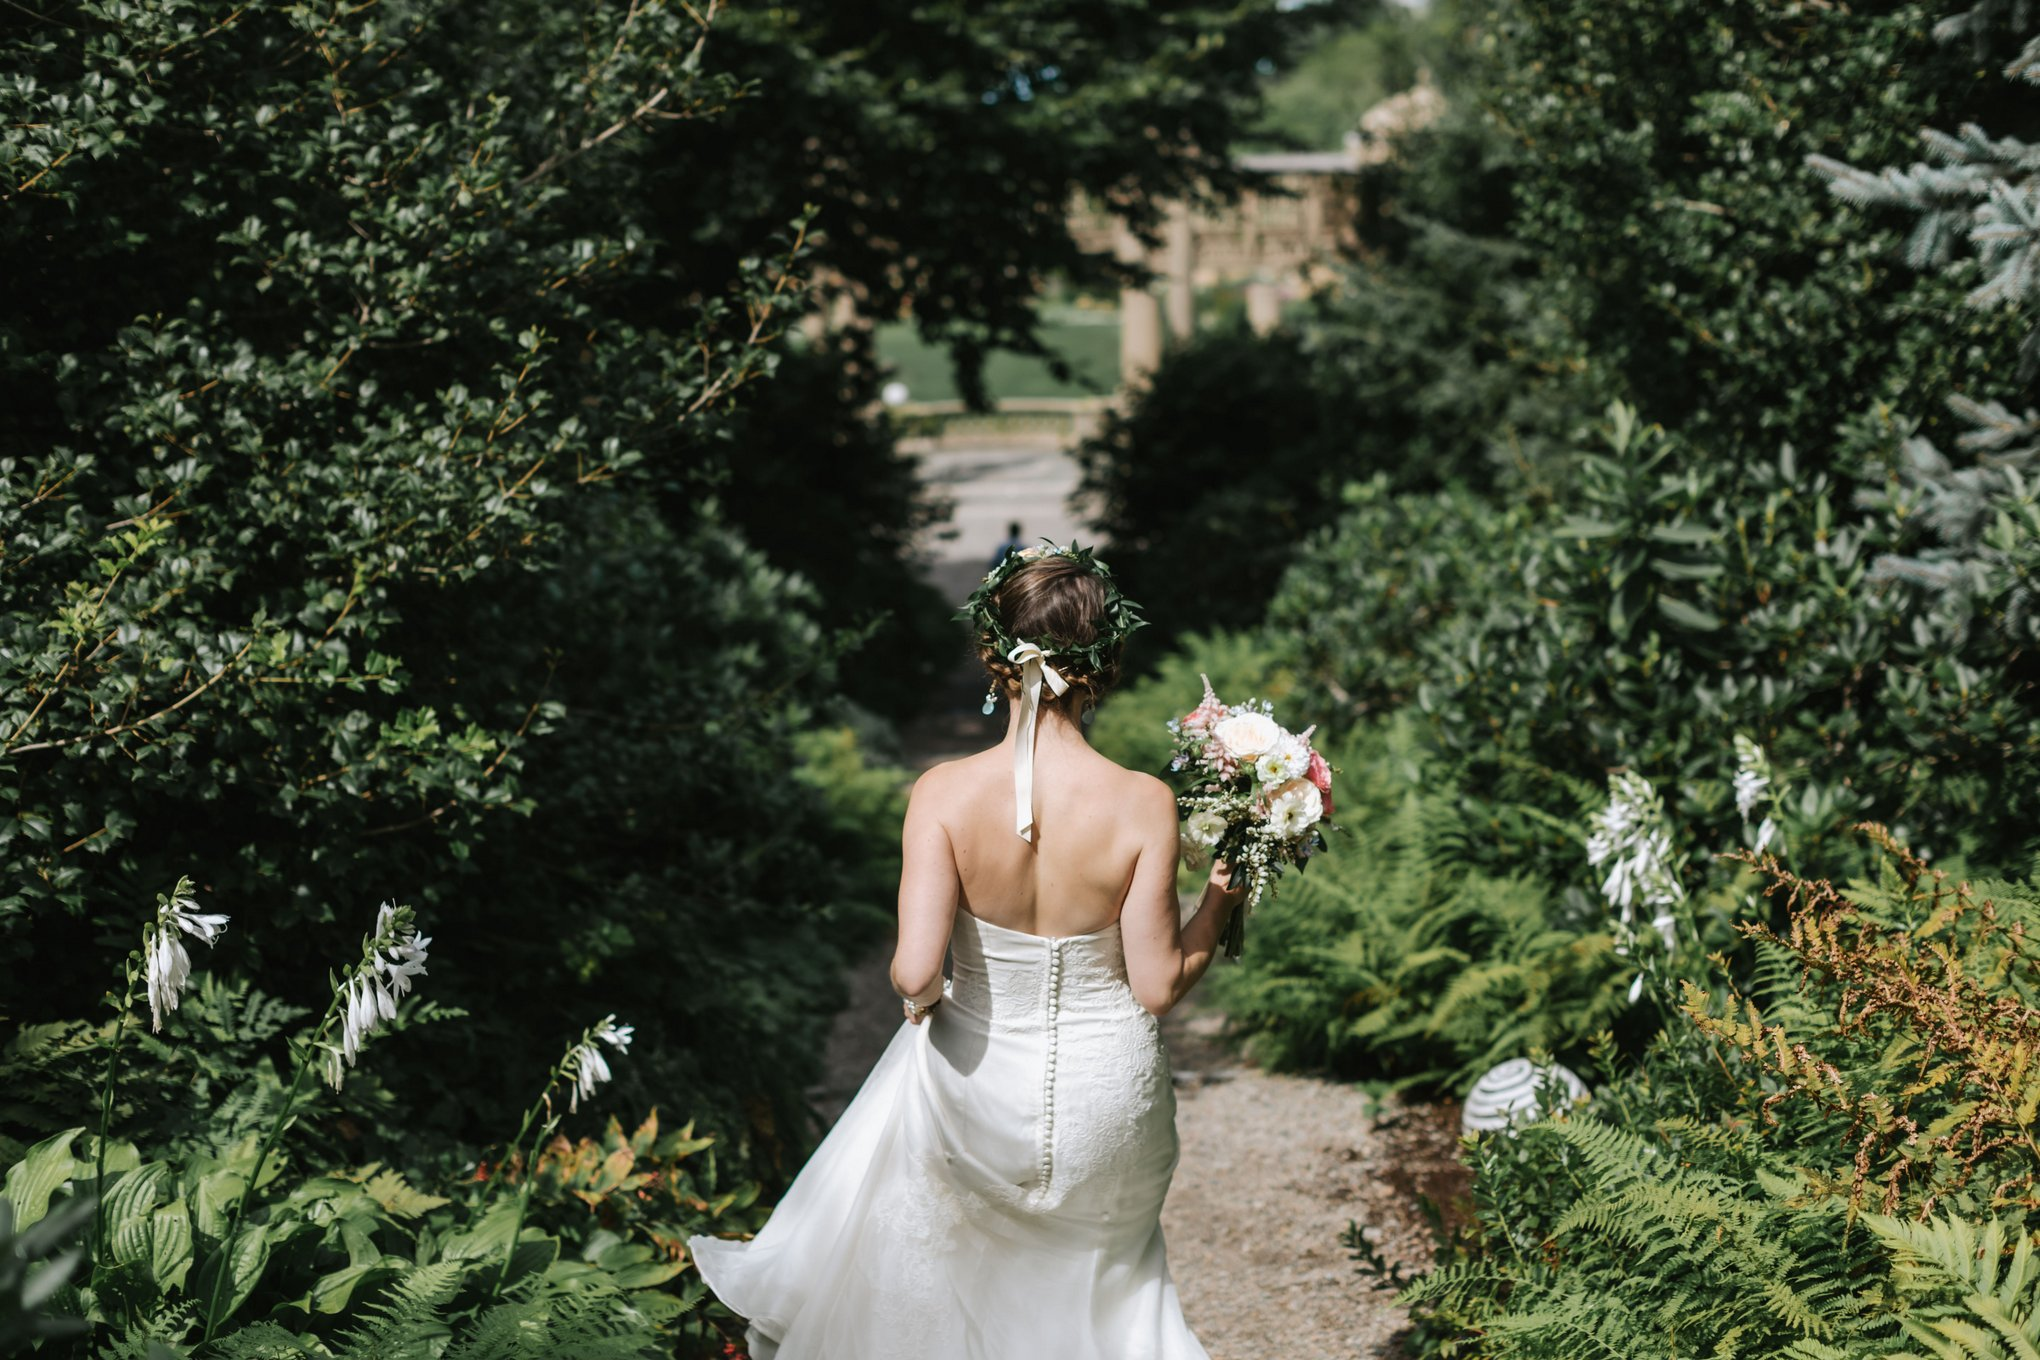 Crane-Estate-Vow-Renewal-Wedding-1.JPG